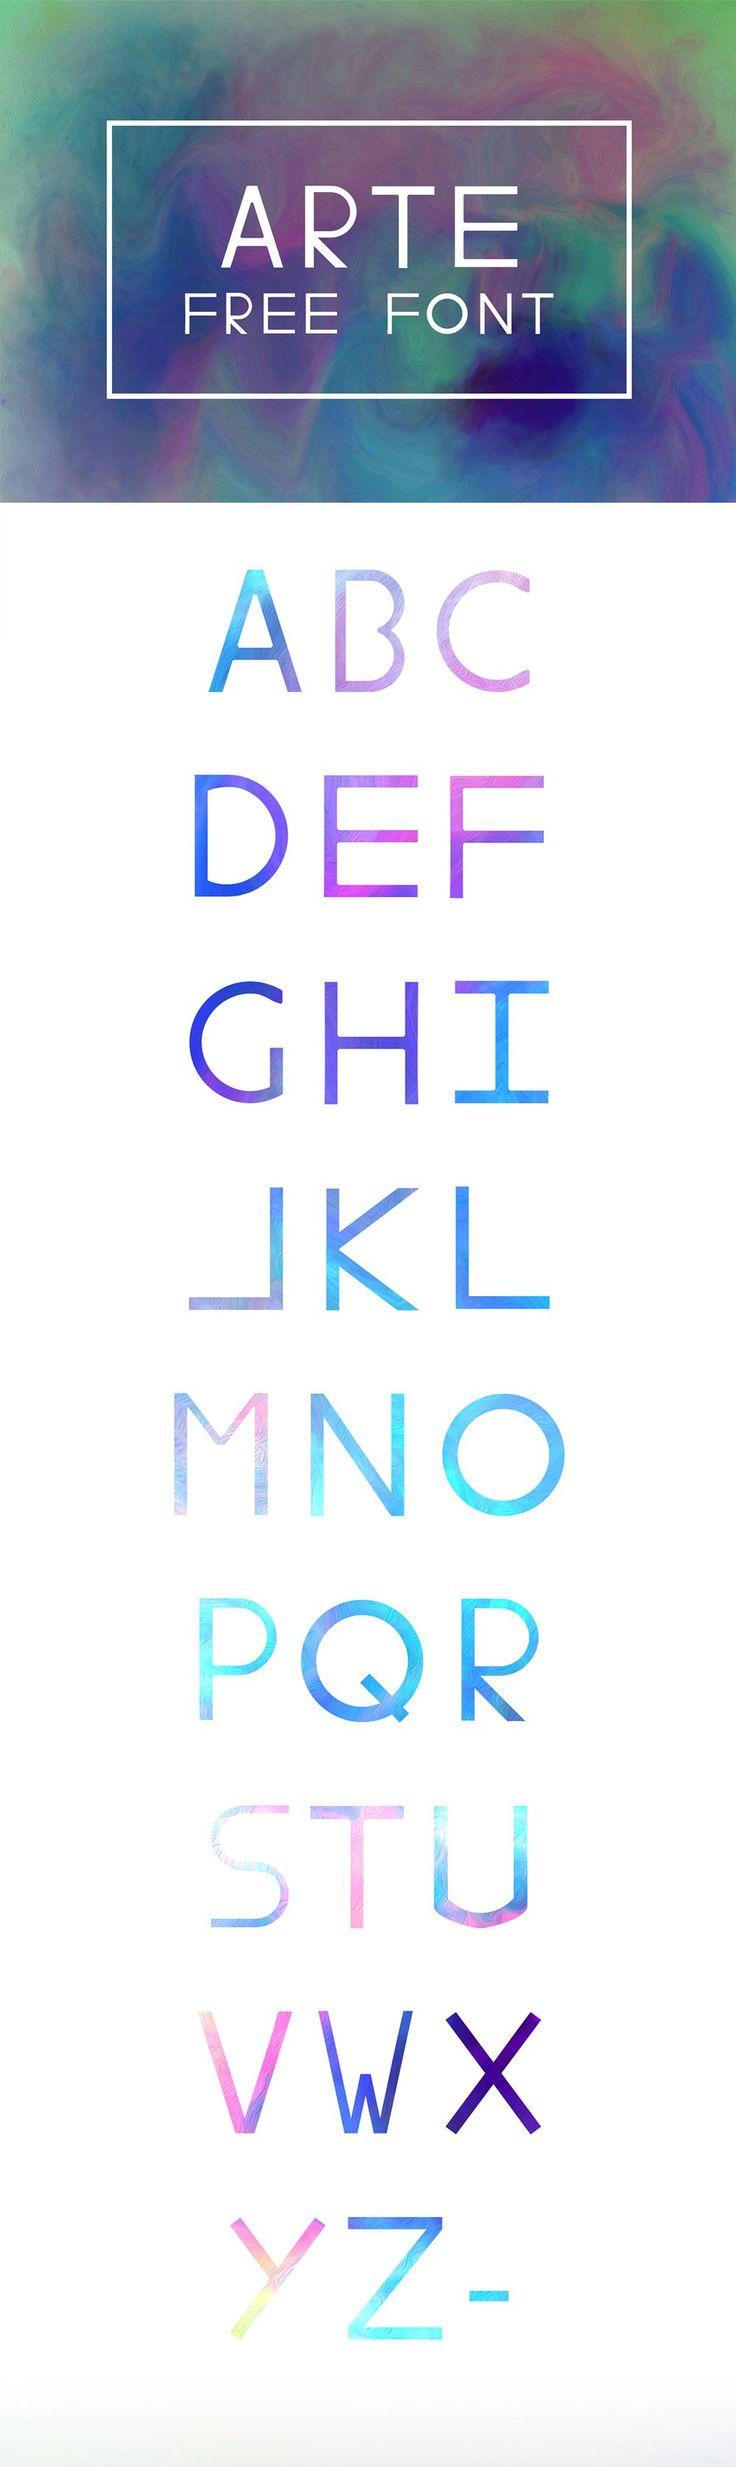 Best Free Fonts For Web Design